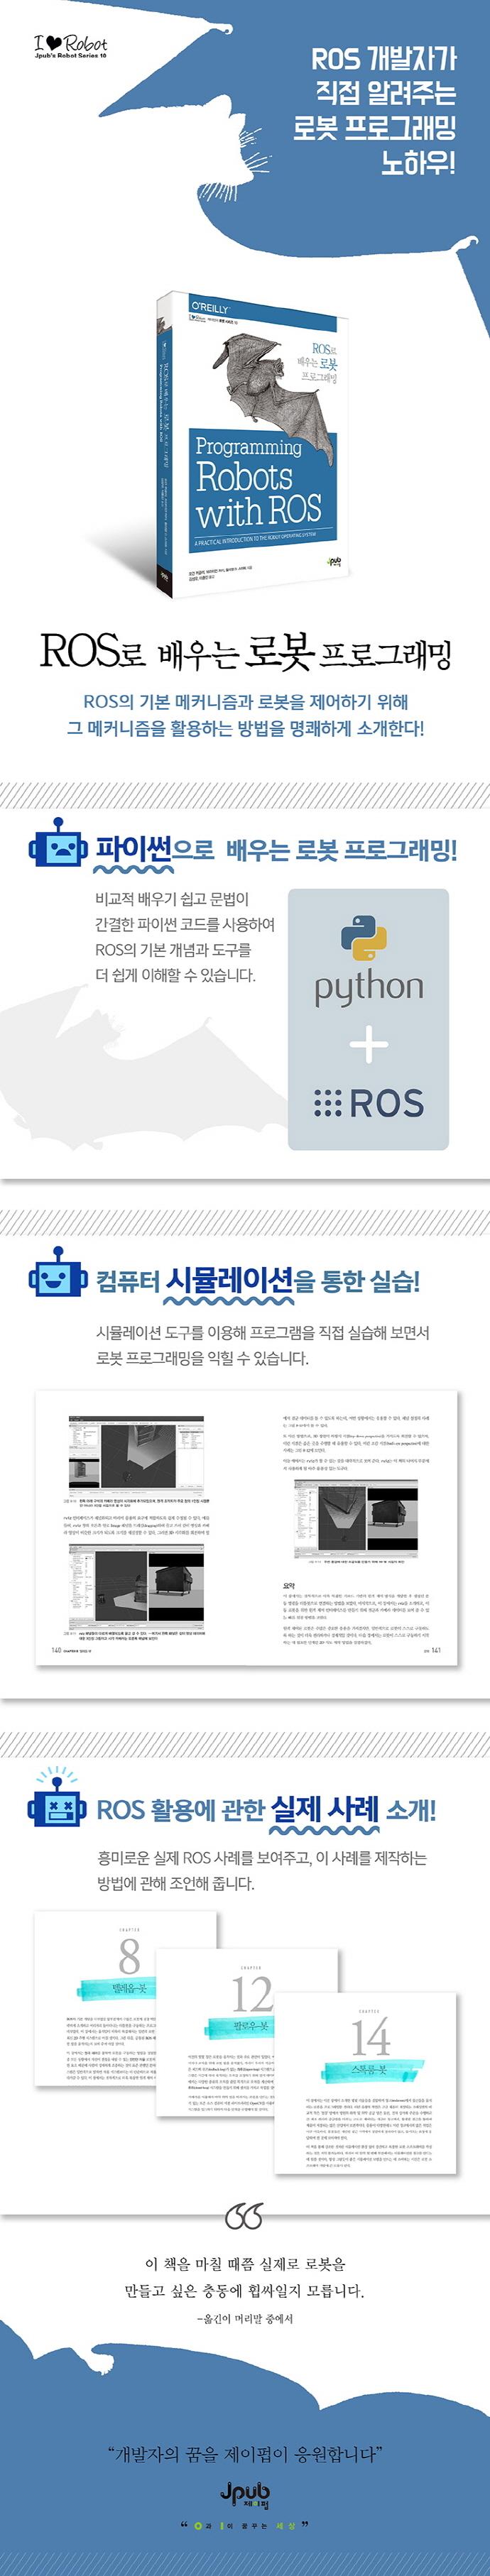 ROS로 배우는 로봇 프로그래밍(제이펍의 로봇 시리즈 10)(반양장) 도서 상세이미지